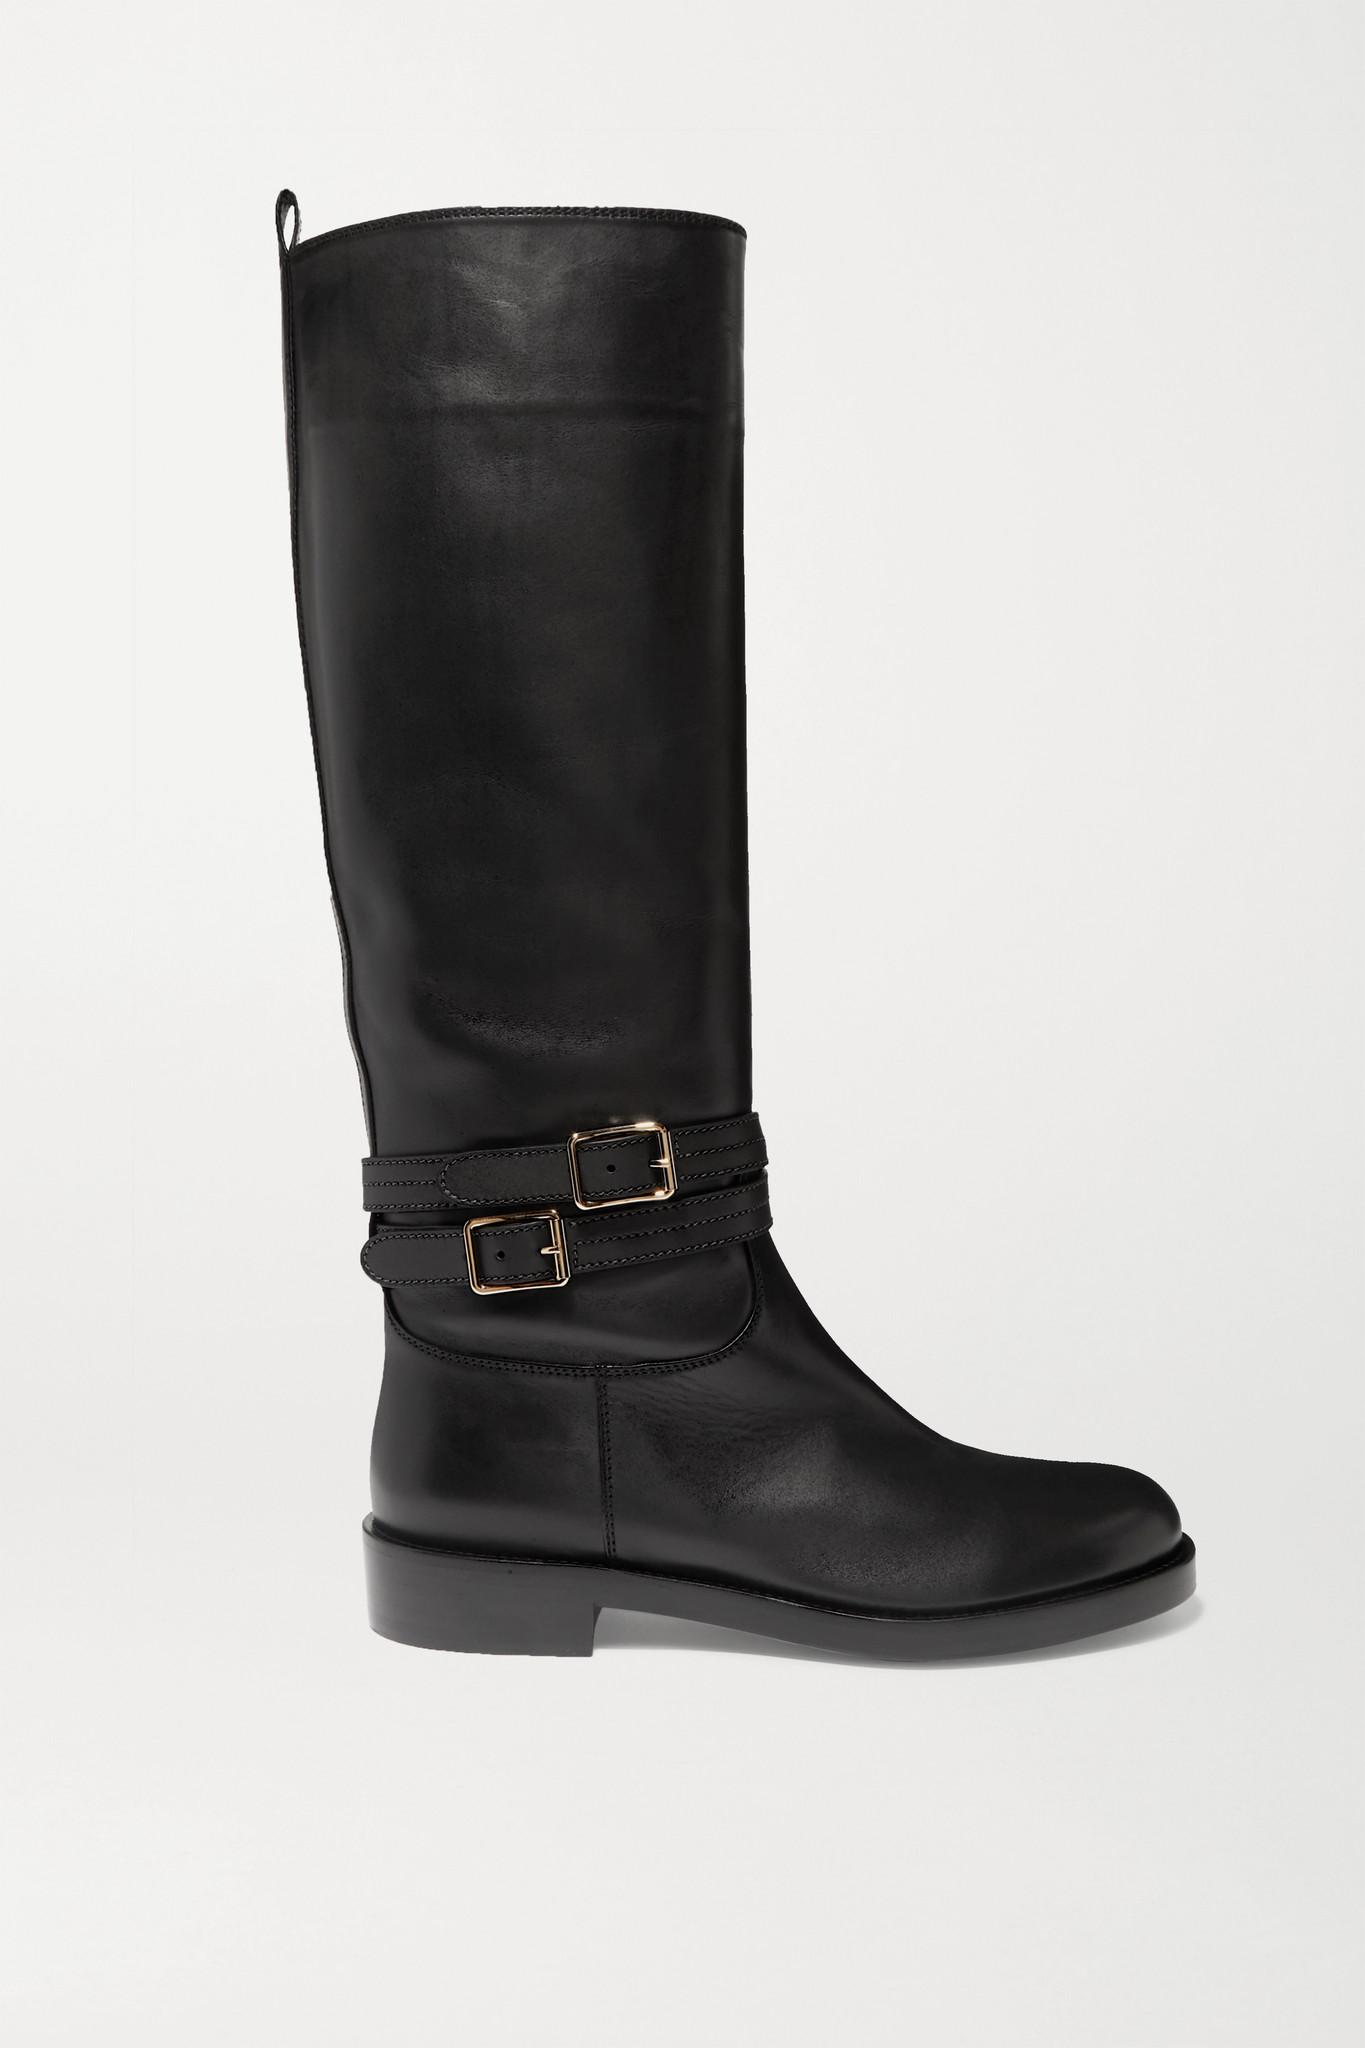 GIANVITO ROSSI - 搭扣皮革及膝长靴 - 黑色 - IT38